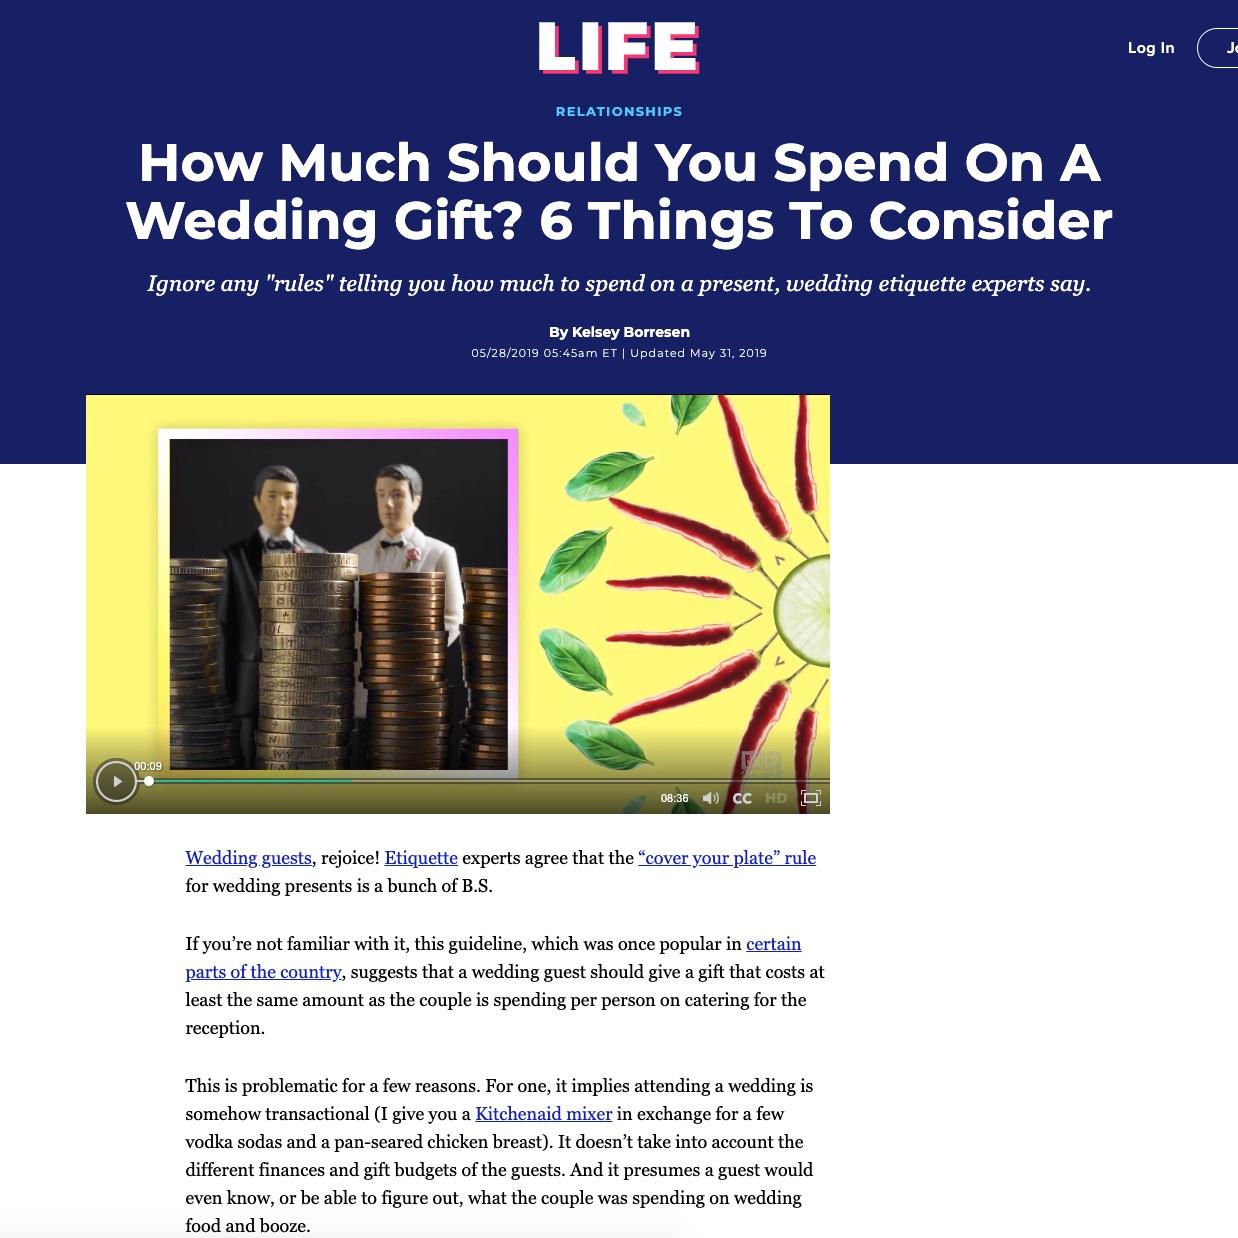 nyc wedding planner jove meyer shared wedding tips with huffpost